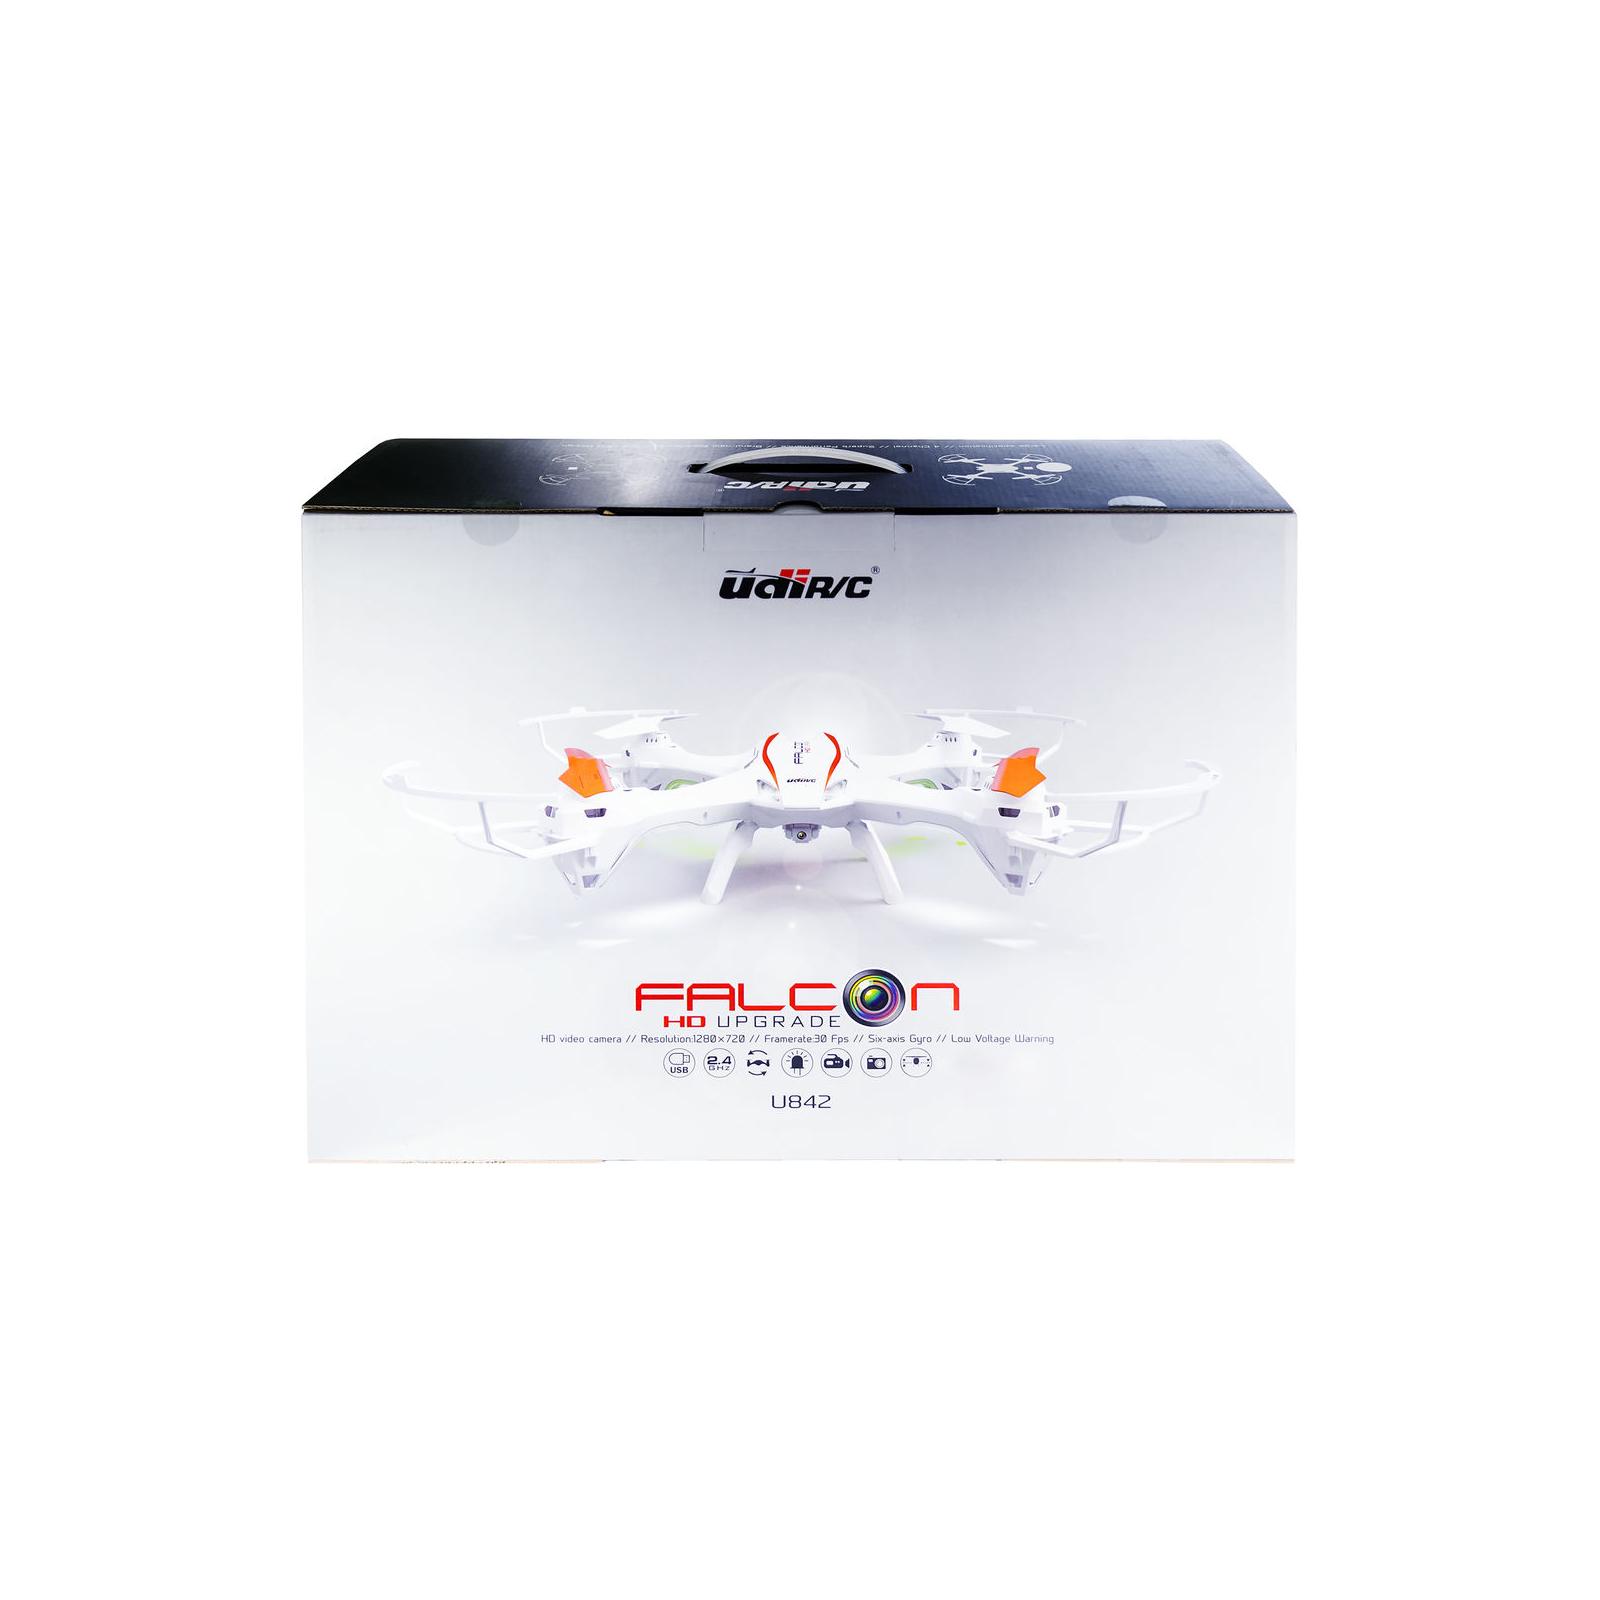 Квадрокоптер UDIRC U842 FALCON 2,4 GHz 486 мм HD бортовая камера 4CH (U842 White) изображение 6